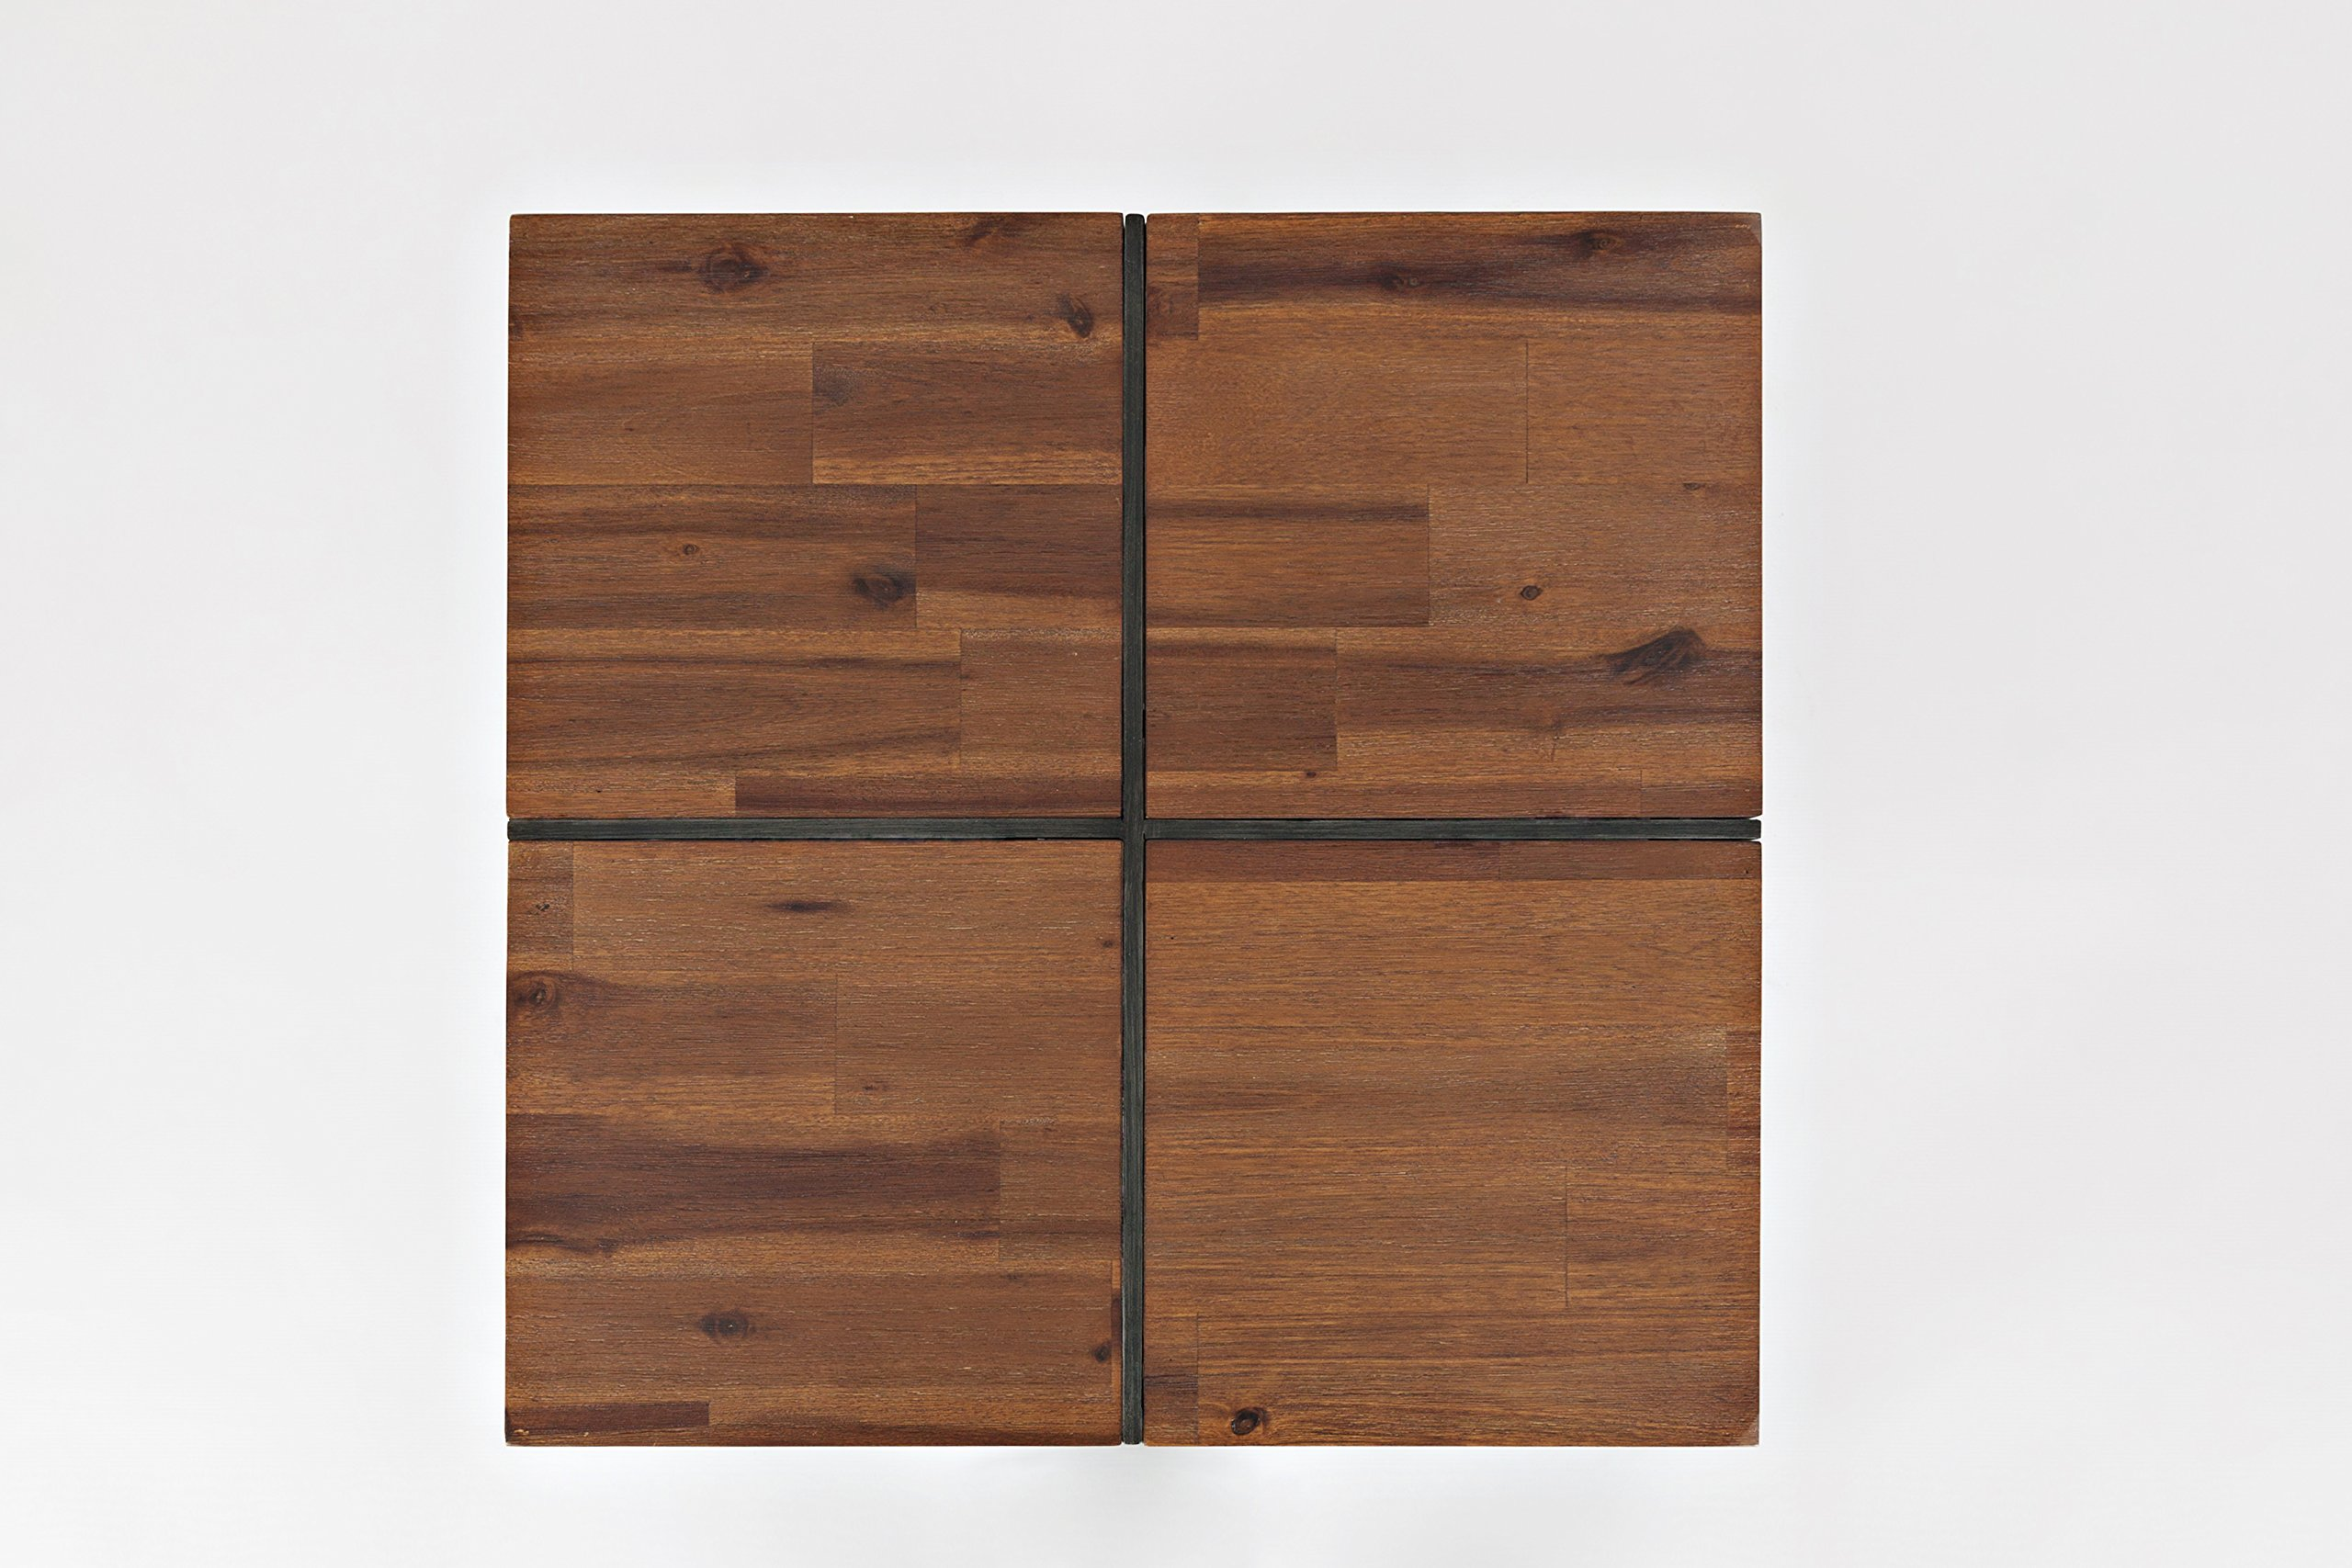 Jofran: 1660-6, Studio 16, Floating End Table, 24''W X 24''D X 24''H, Studio 16 Finish, (Set of 1)